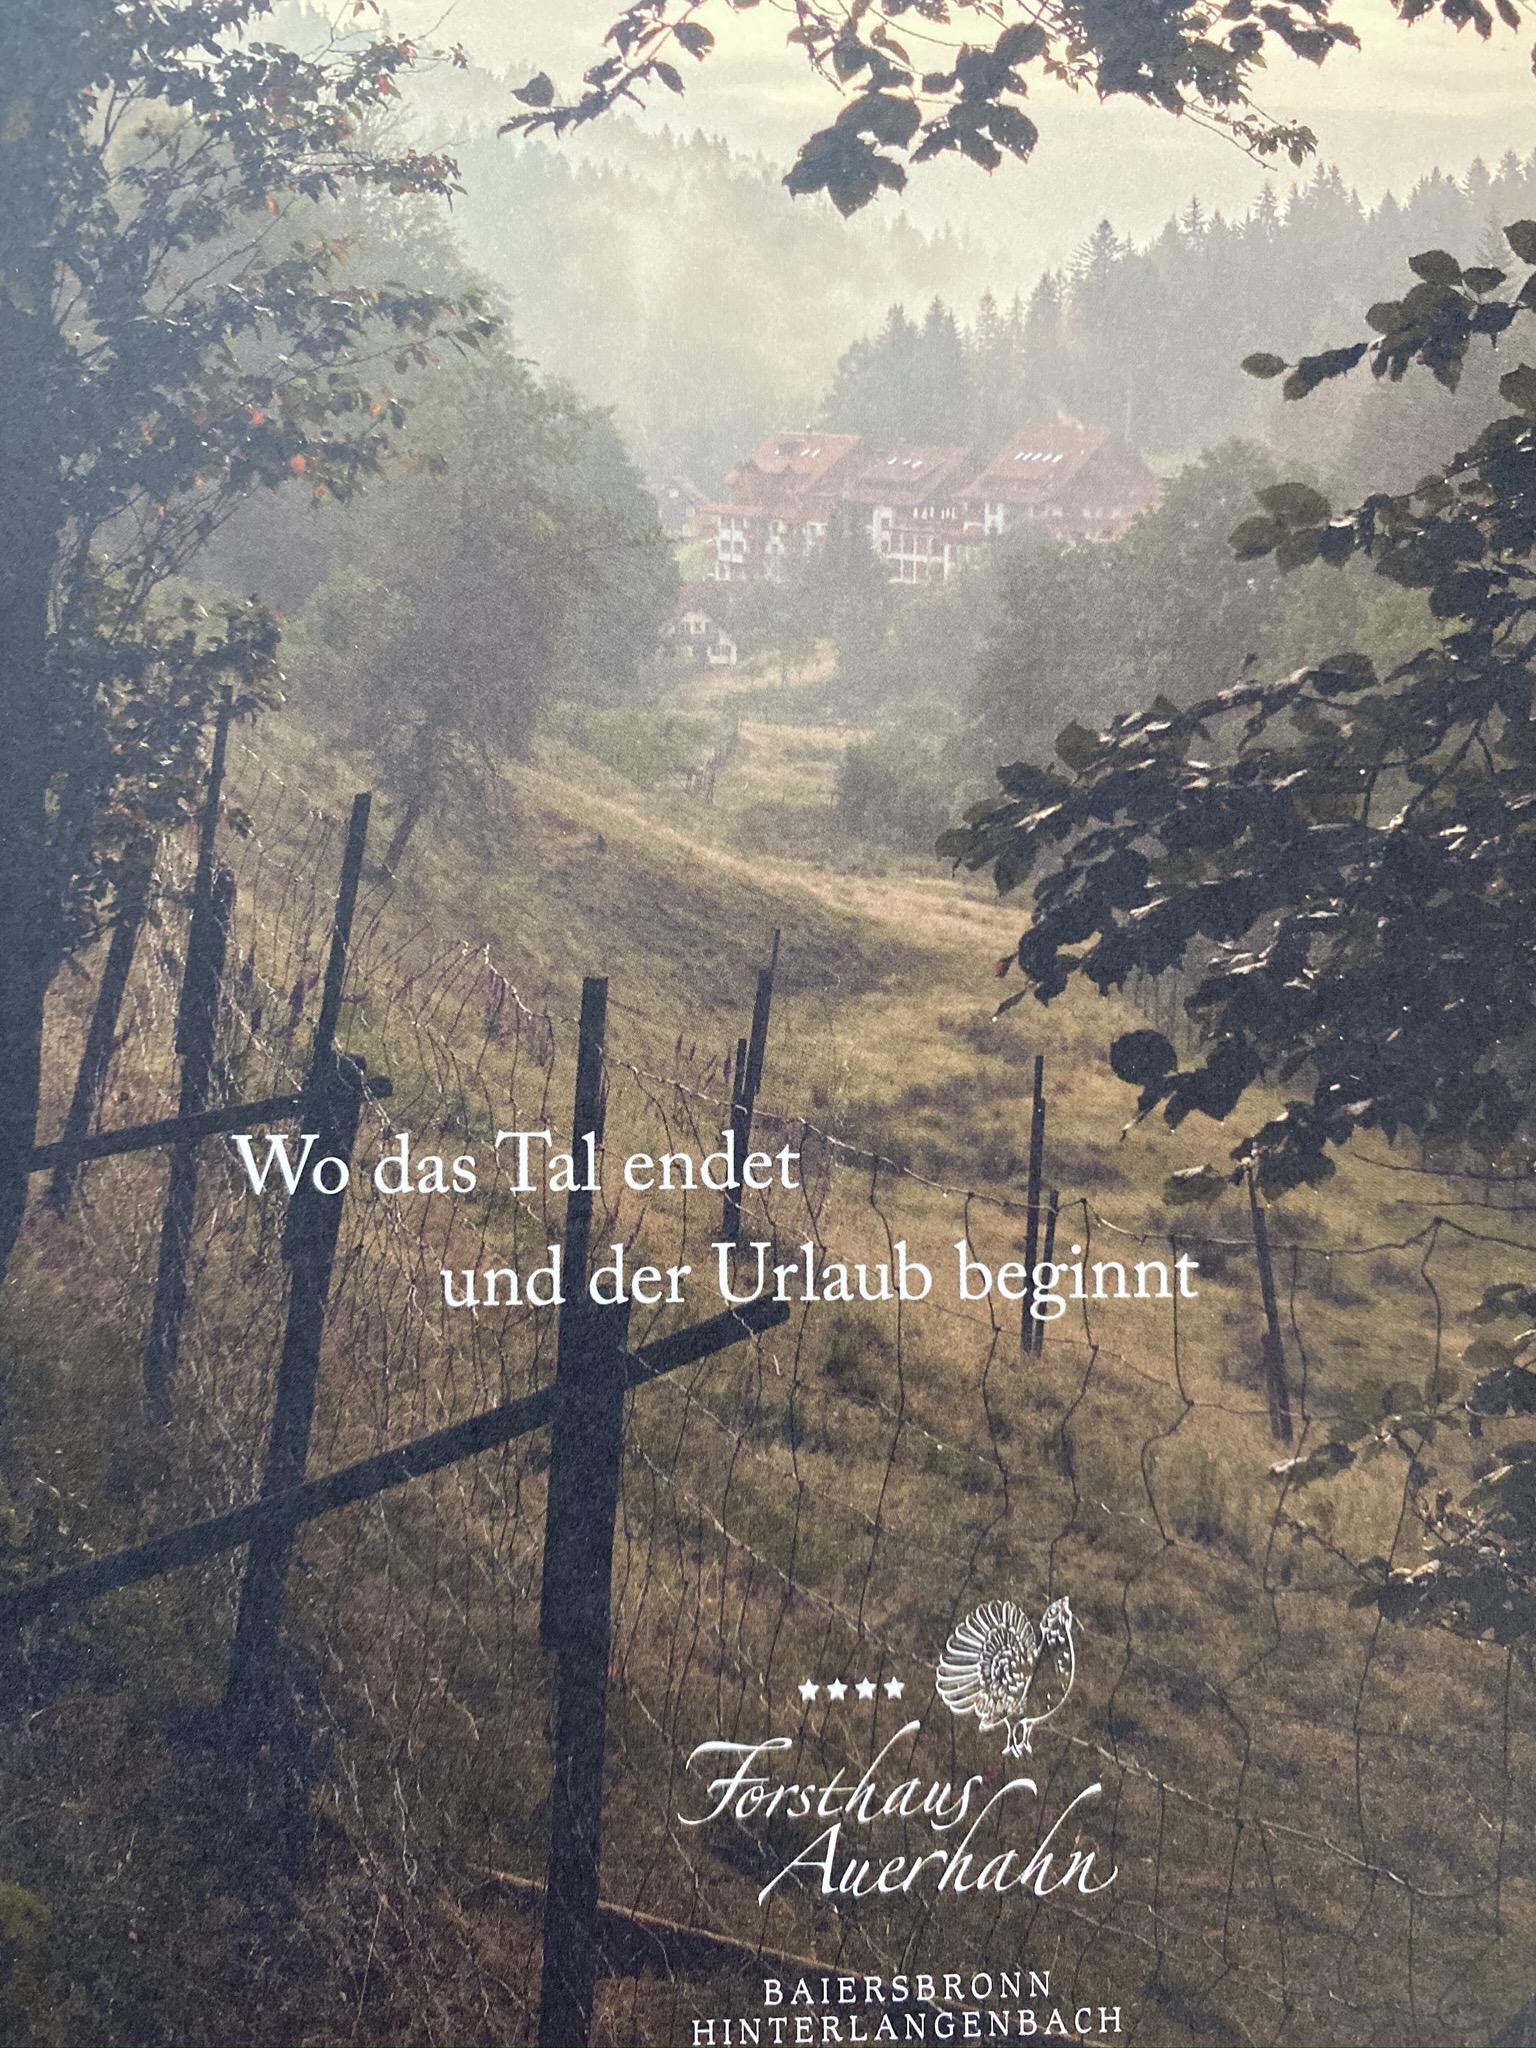 Hotelkatalog aus dem Nordscharzwald, Hinterlangenbach...